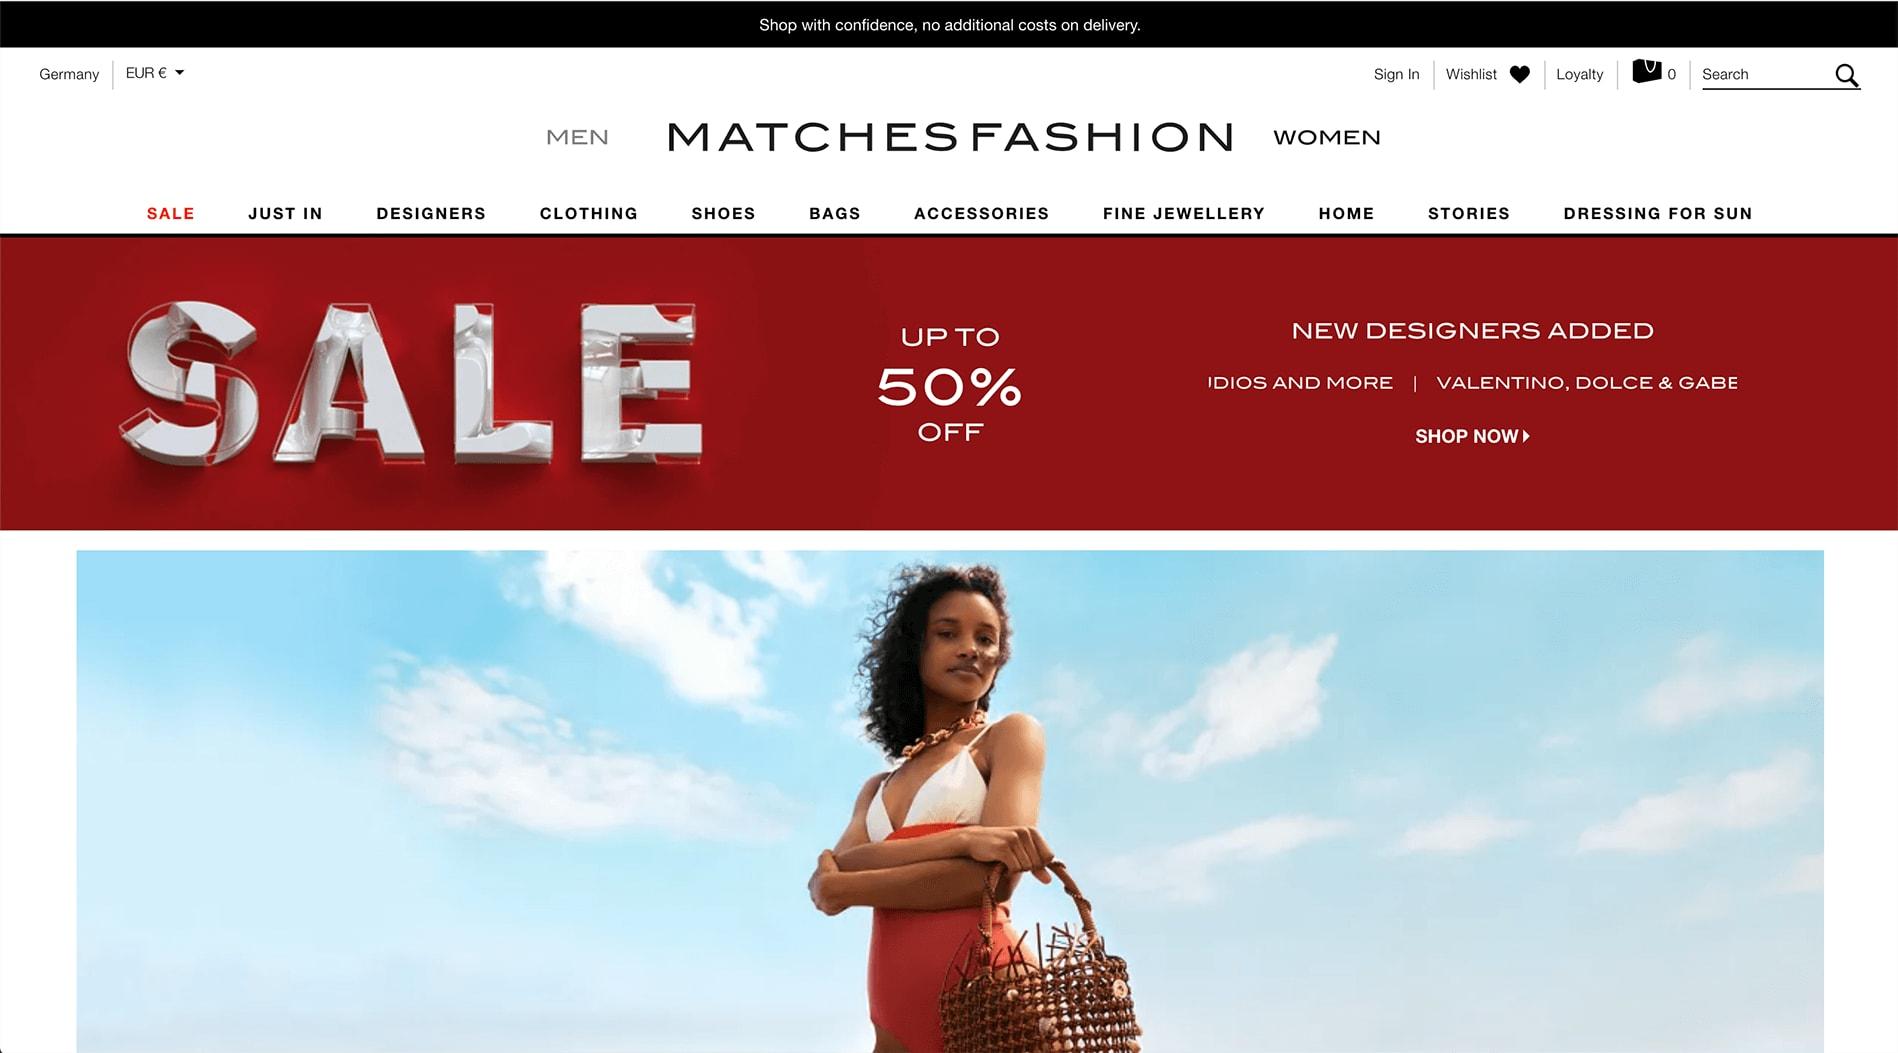 MATCHESFASHION Affiliate Program